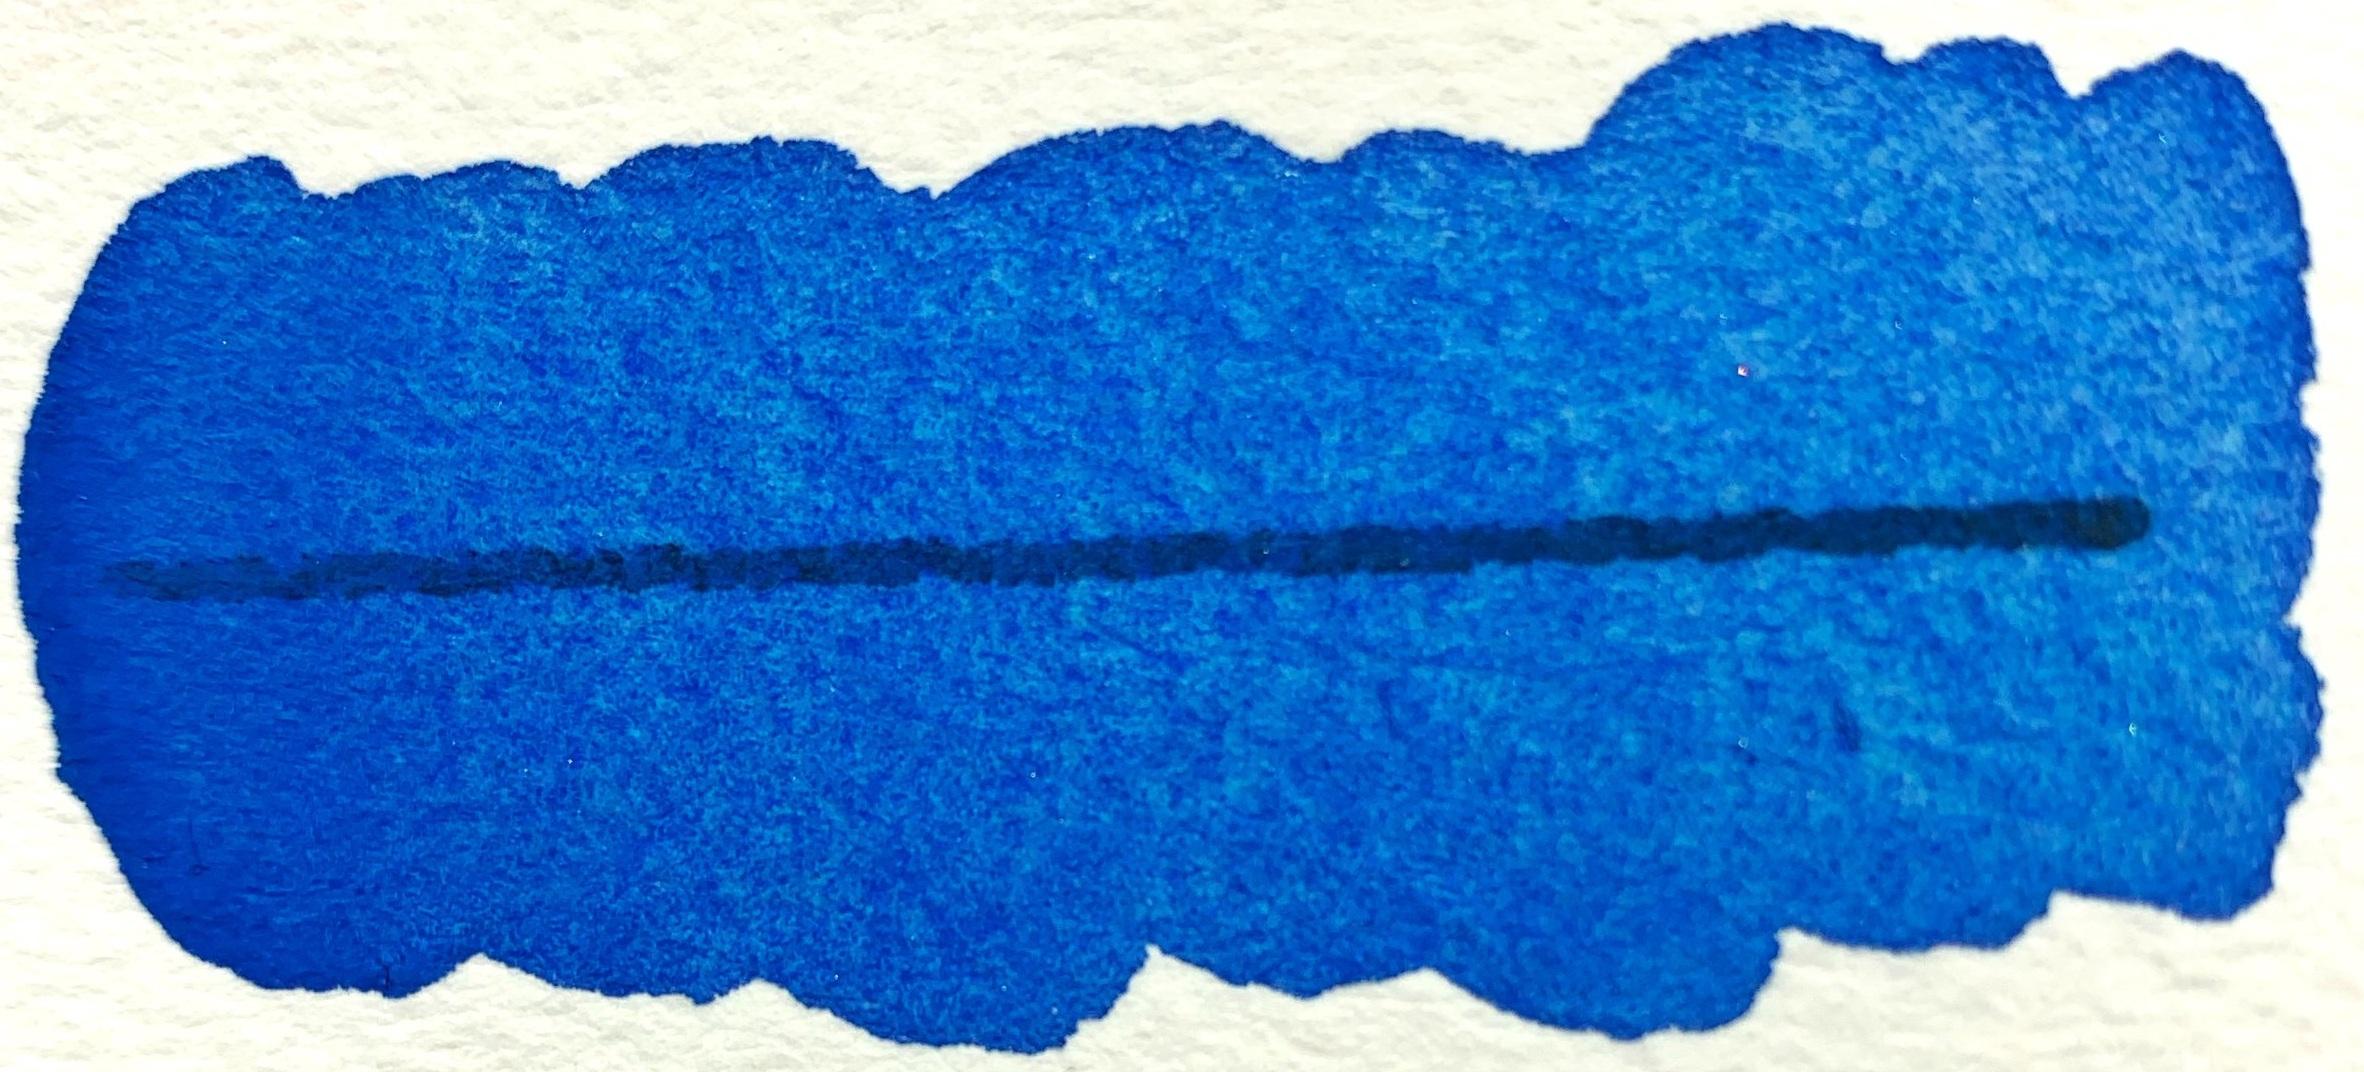 Sapphire - PB28, PB29, opaque, excellent lightfastness, staining